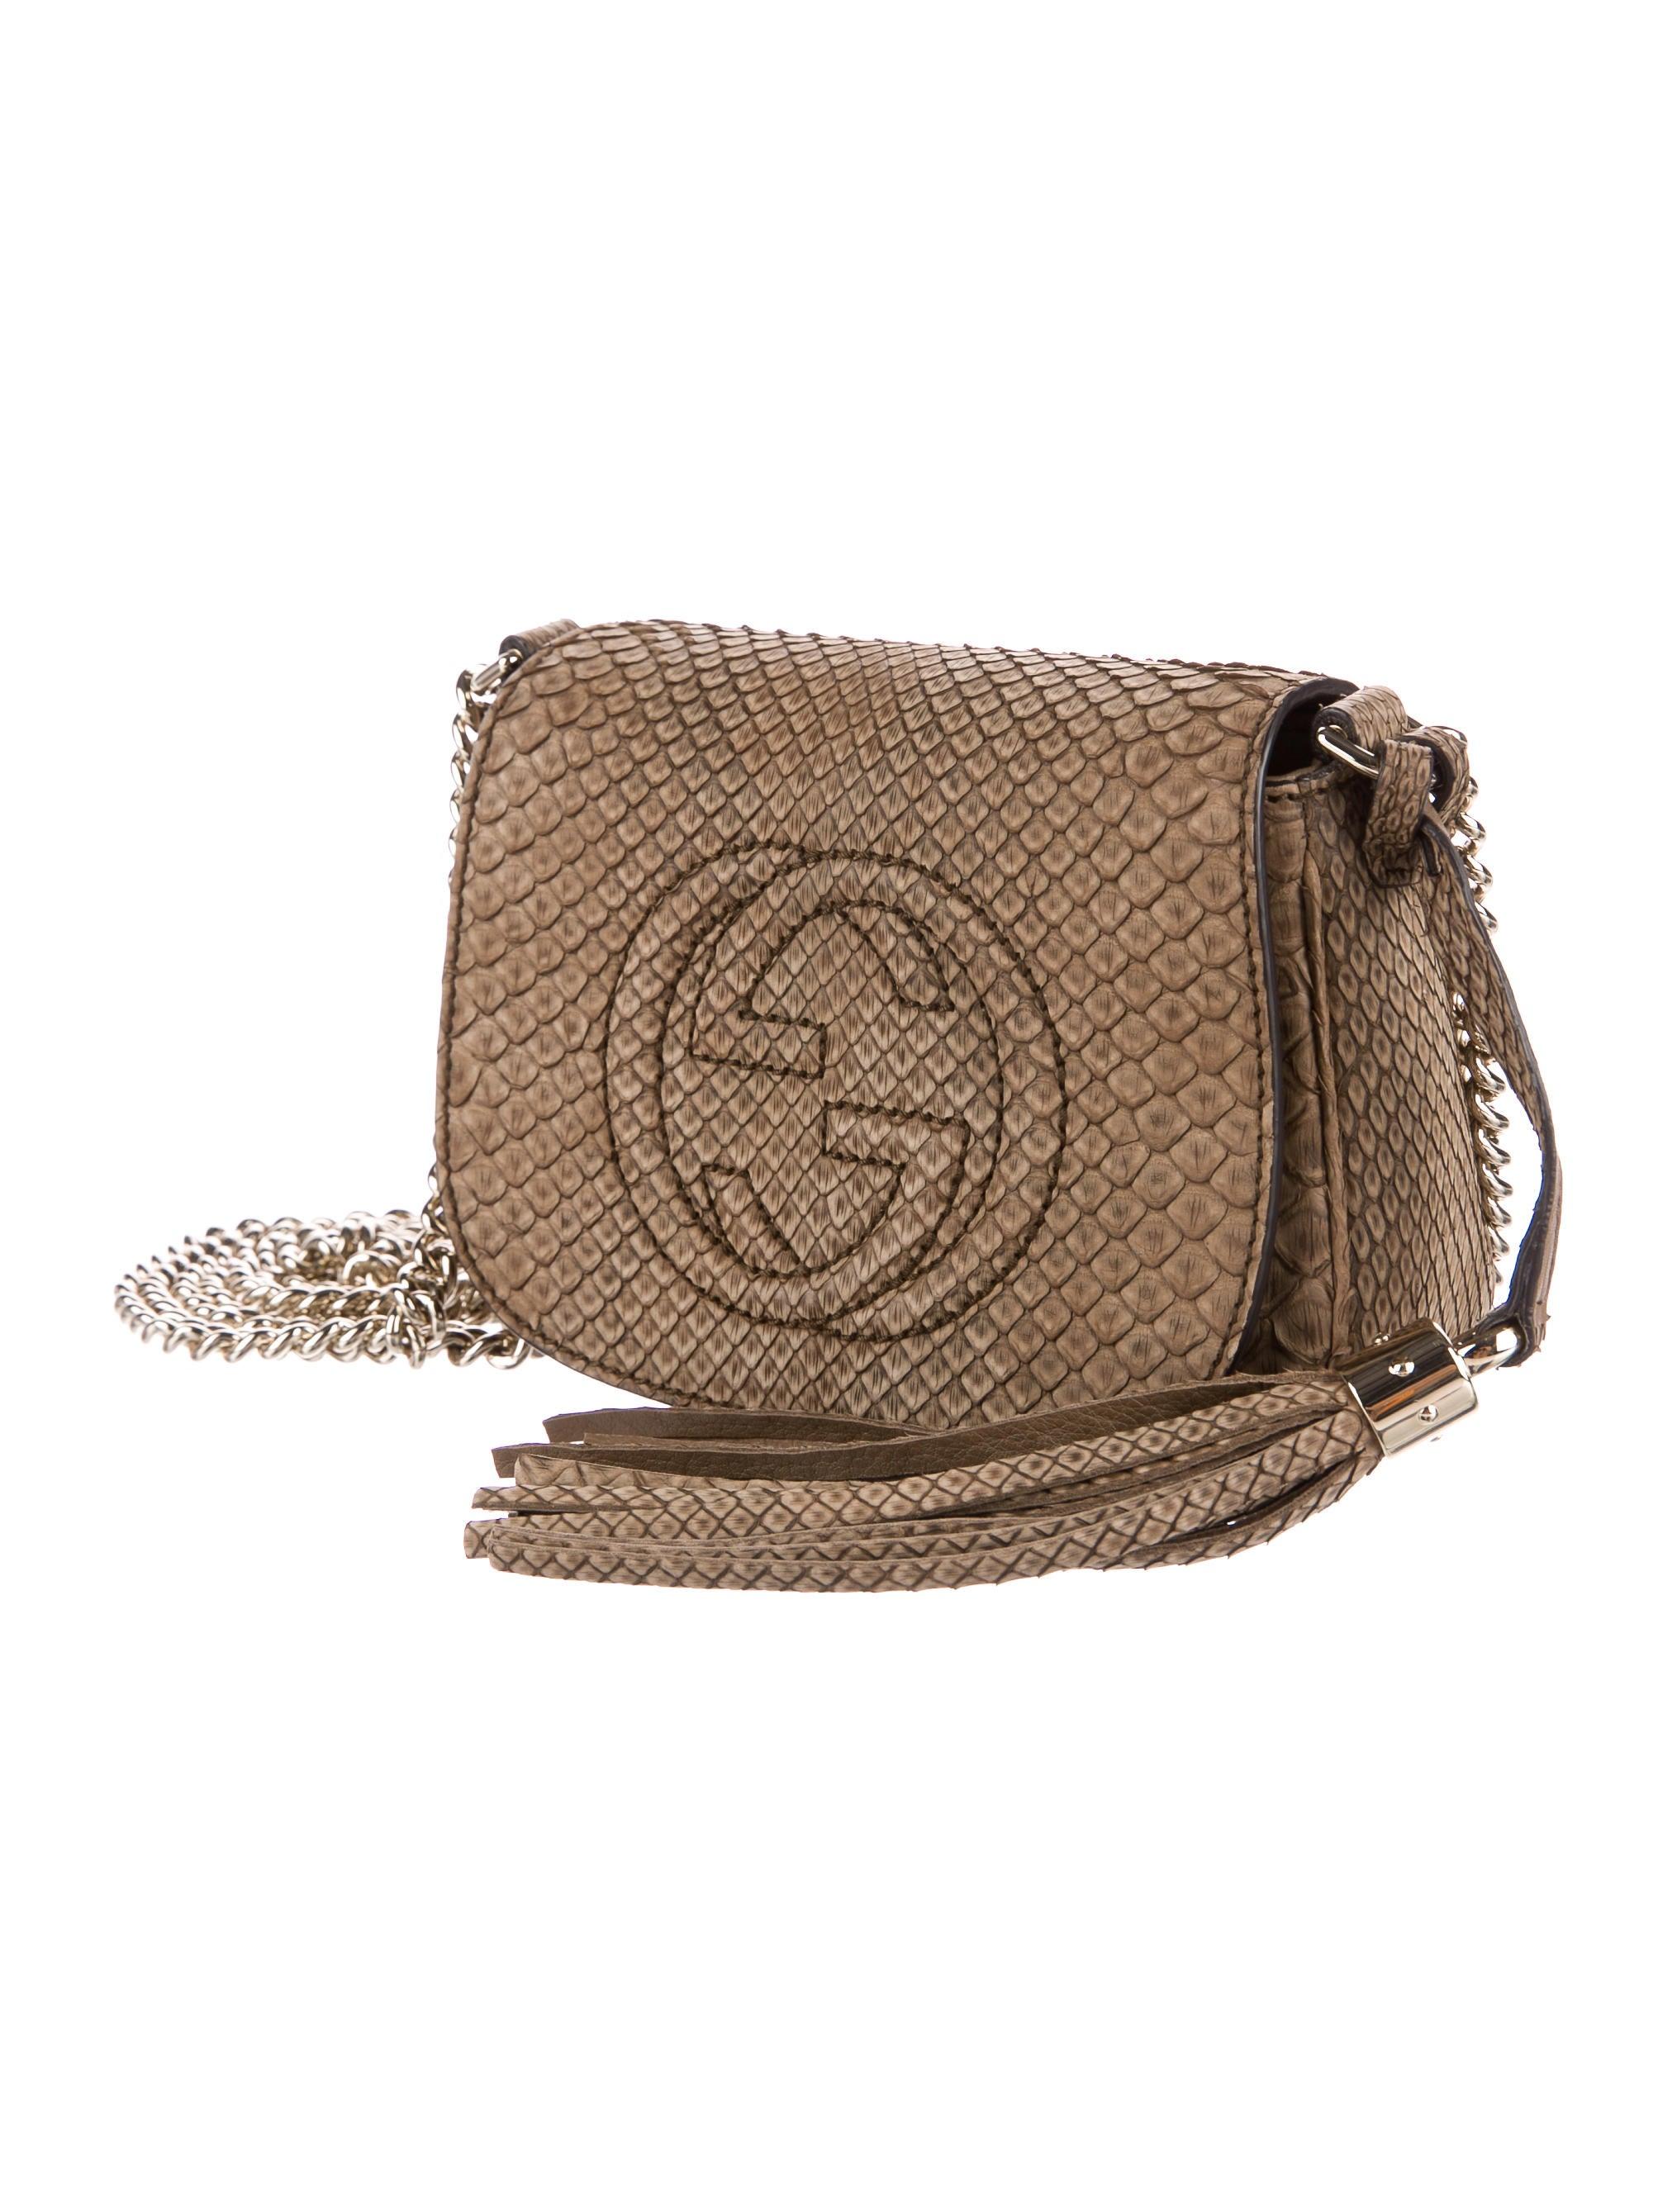 a2f0b1906299 Gucci Python Soho Chain Crossbody Bag - Handbags - GUC163309 | The RealReal